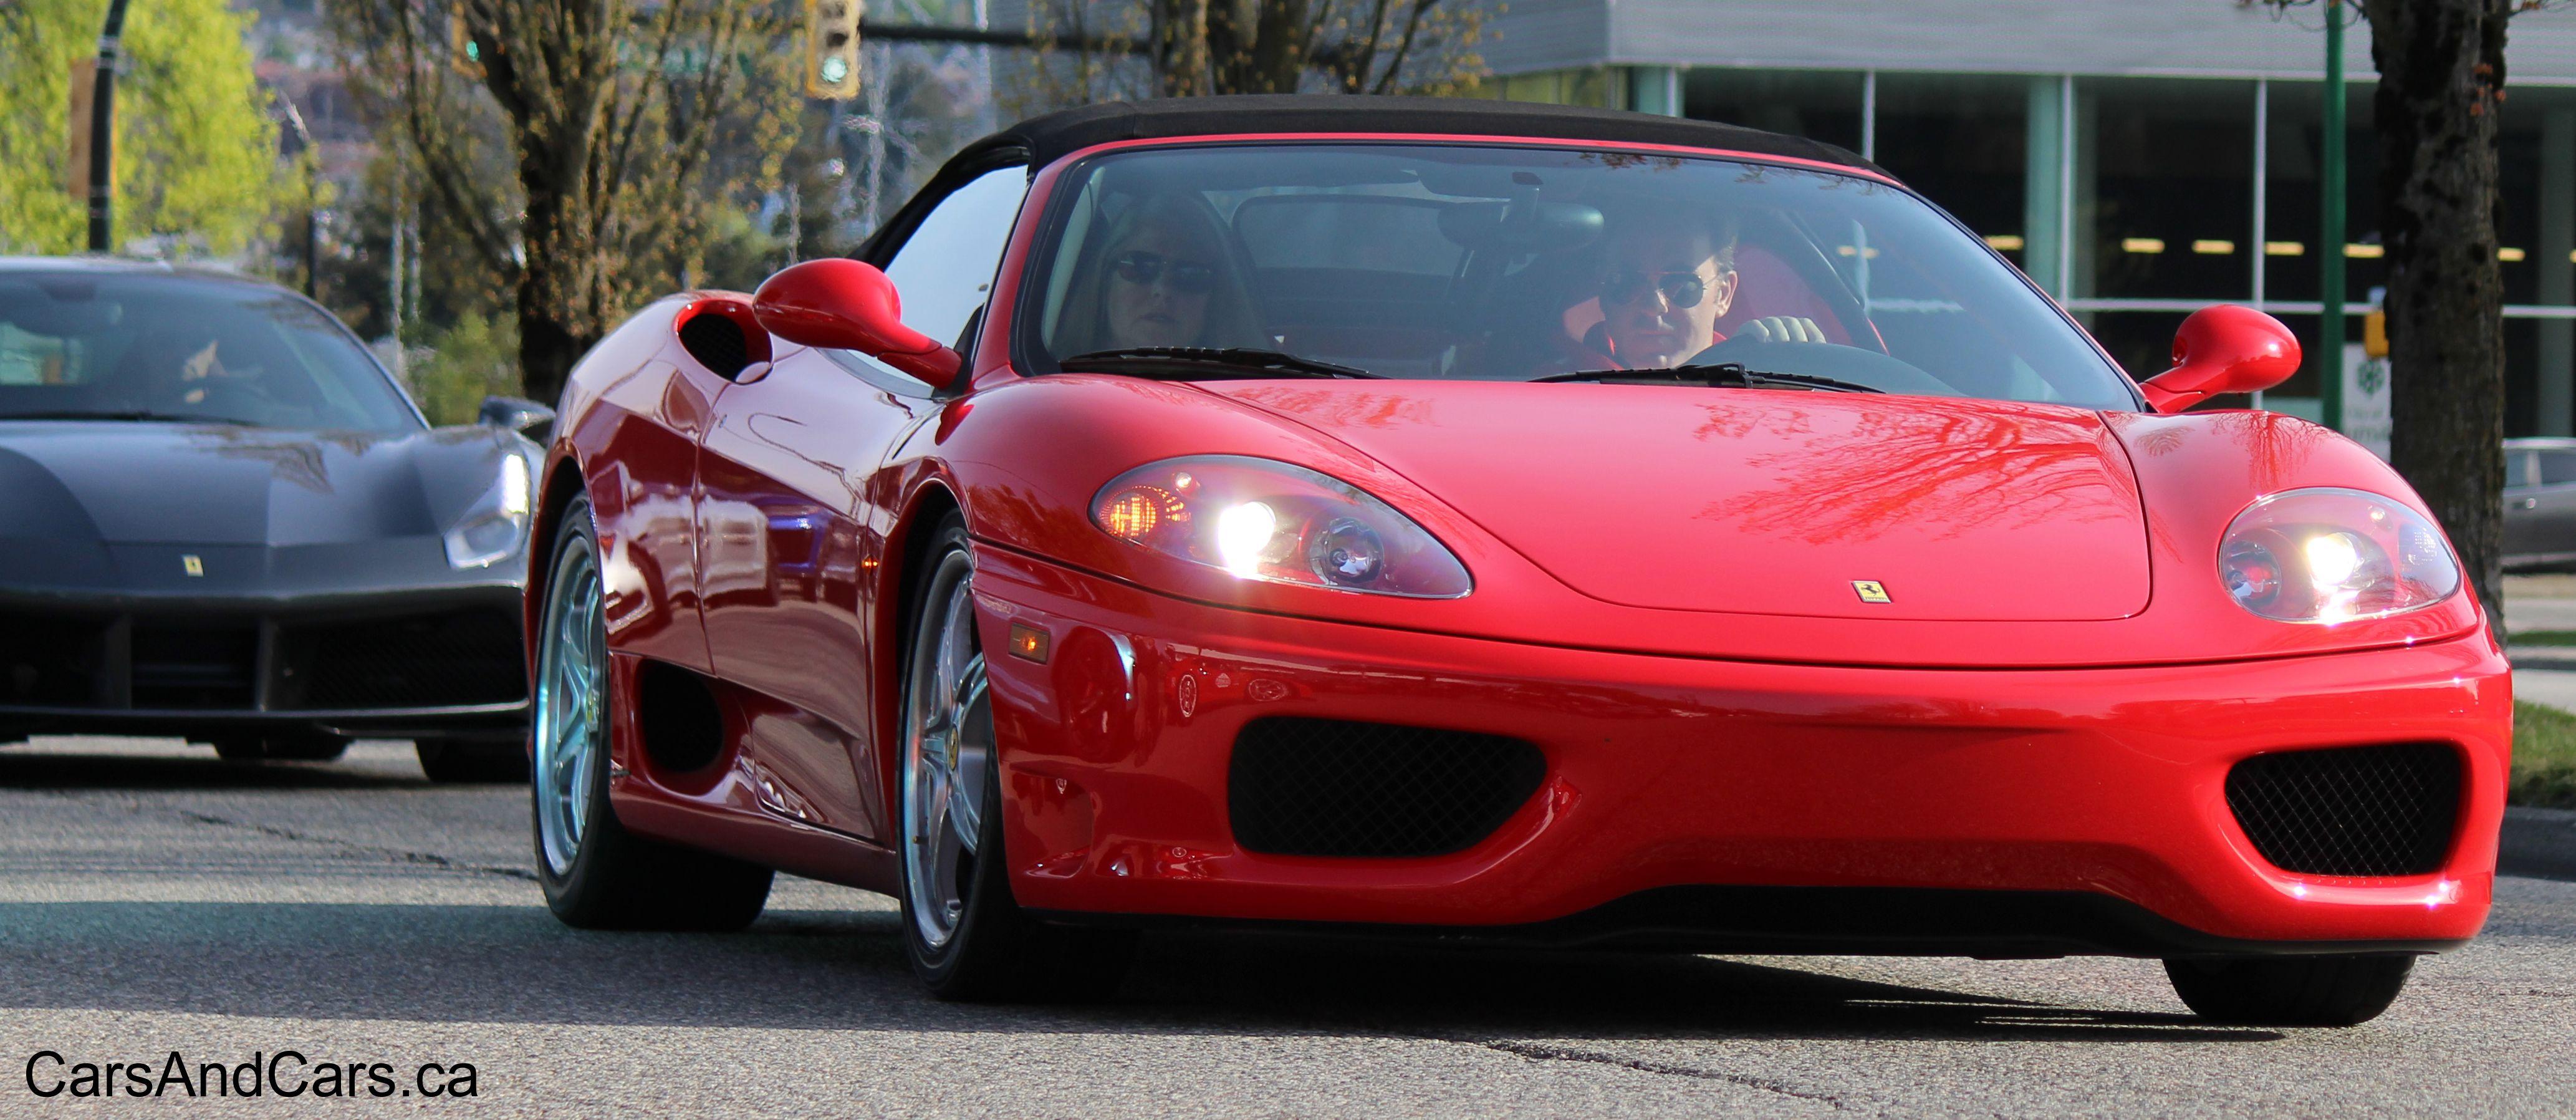 Ferrari 360 Modena Spider Ferrari For Sale Ferrari 360 Dream Cars